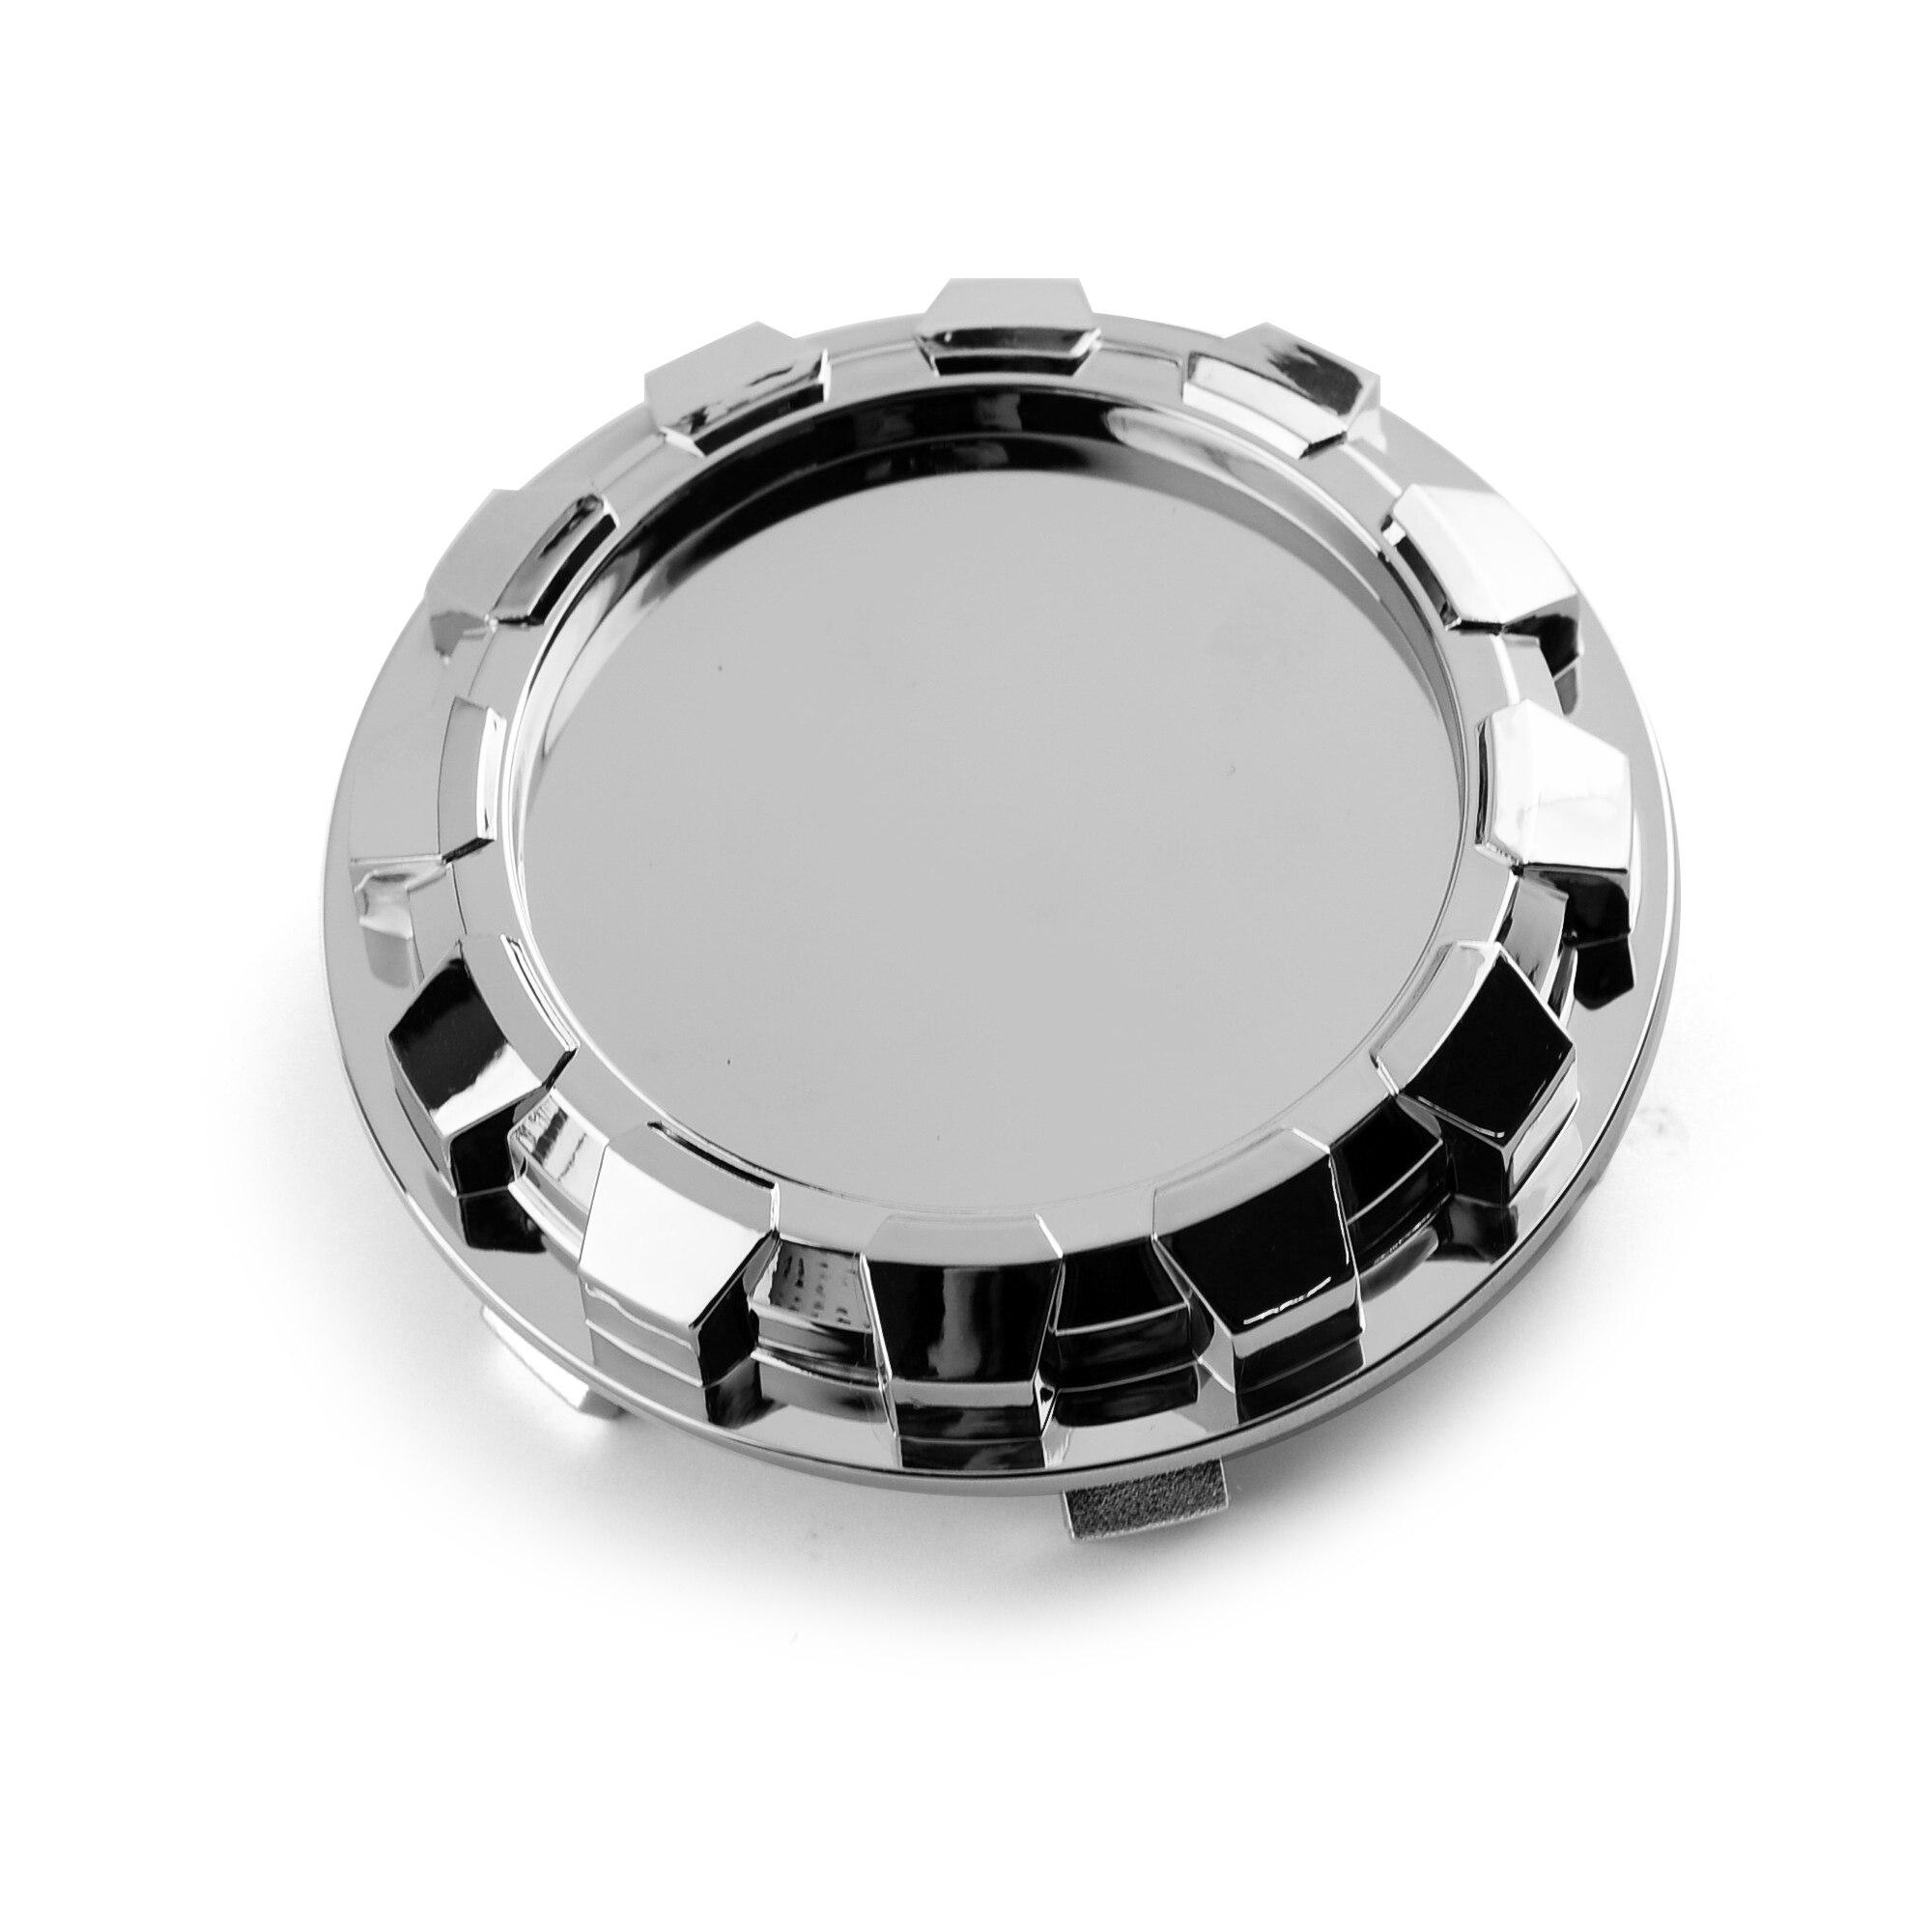 Emblemas p/ roda